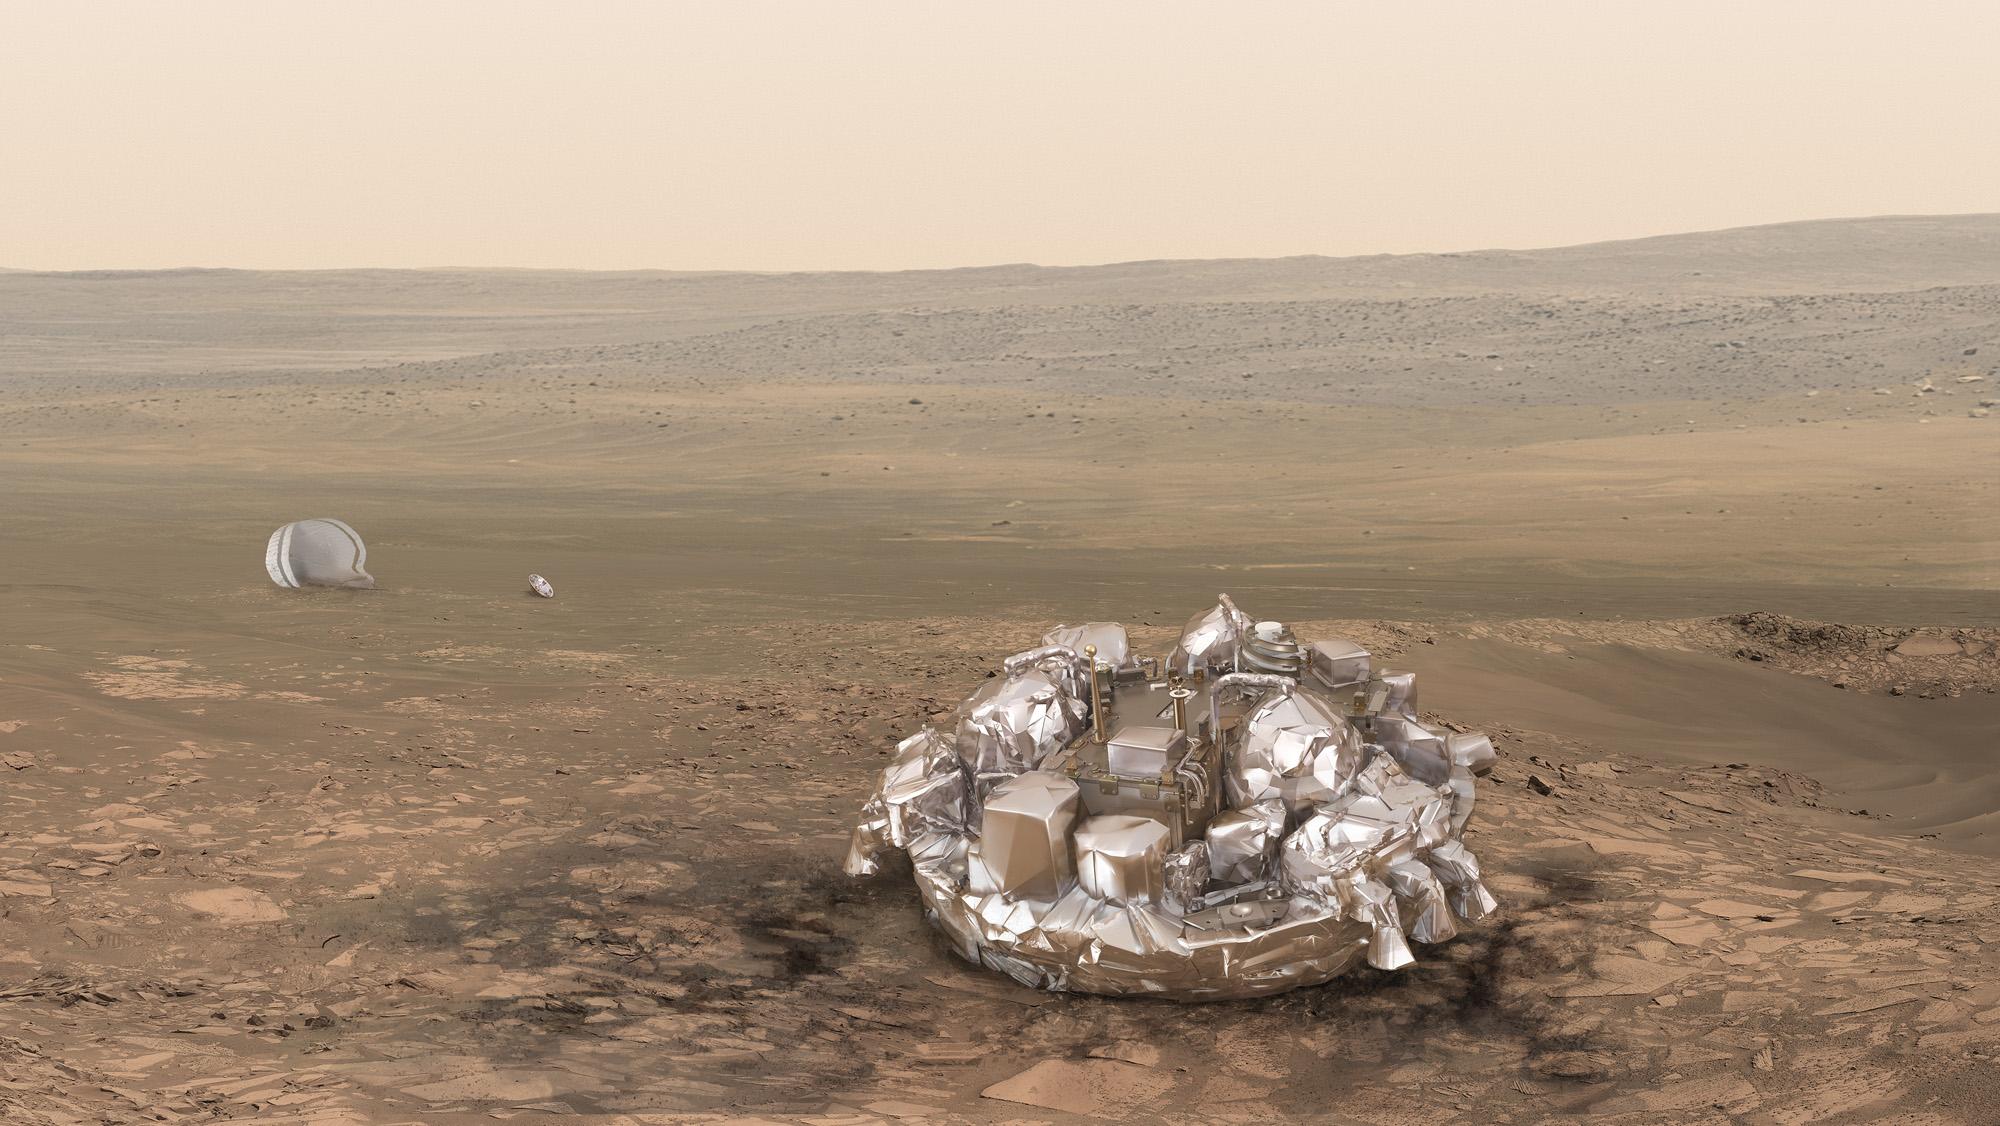 European Spacecraft Reaches Mars Orbit, But Lander's Fate Uncertain